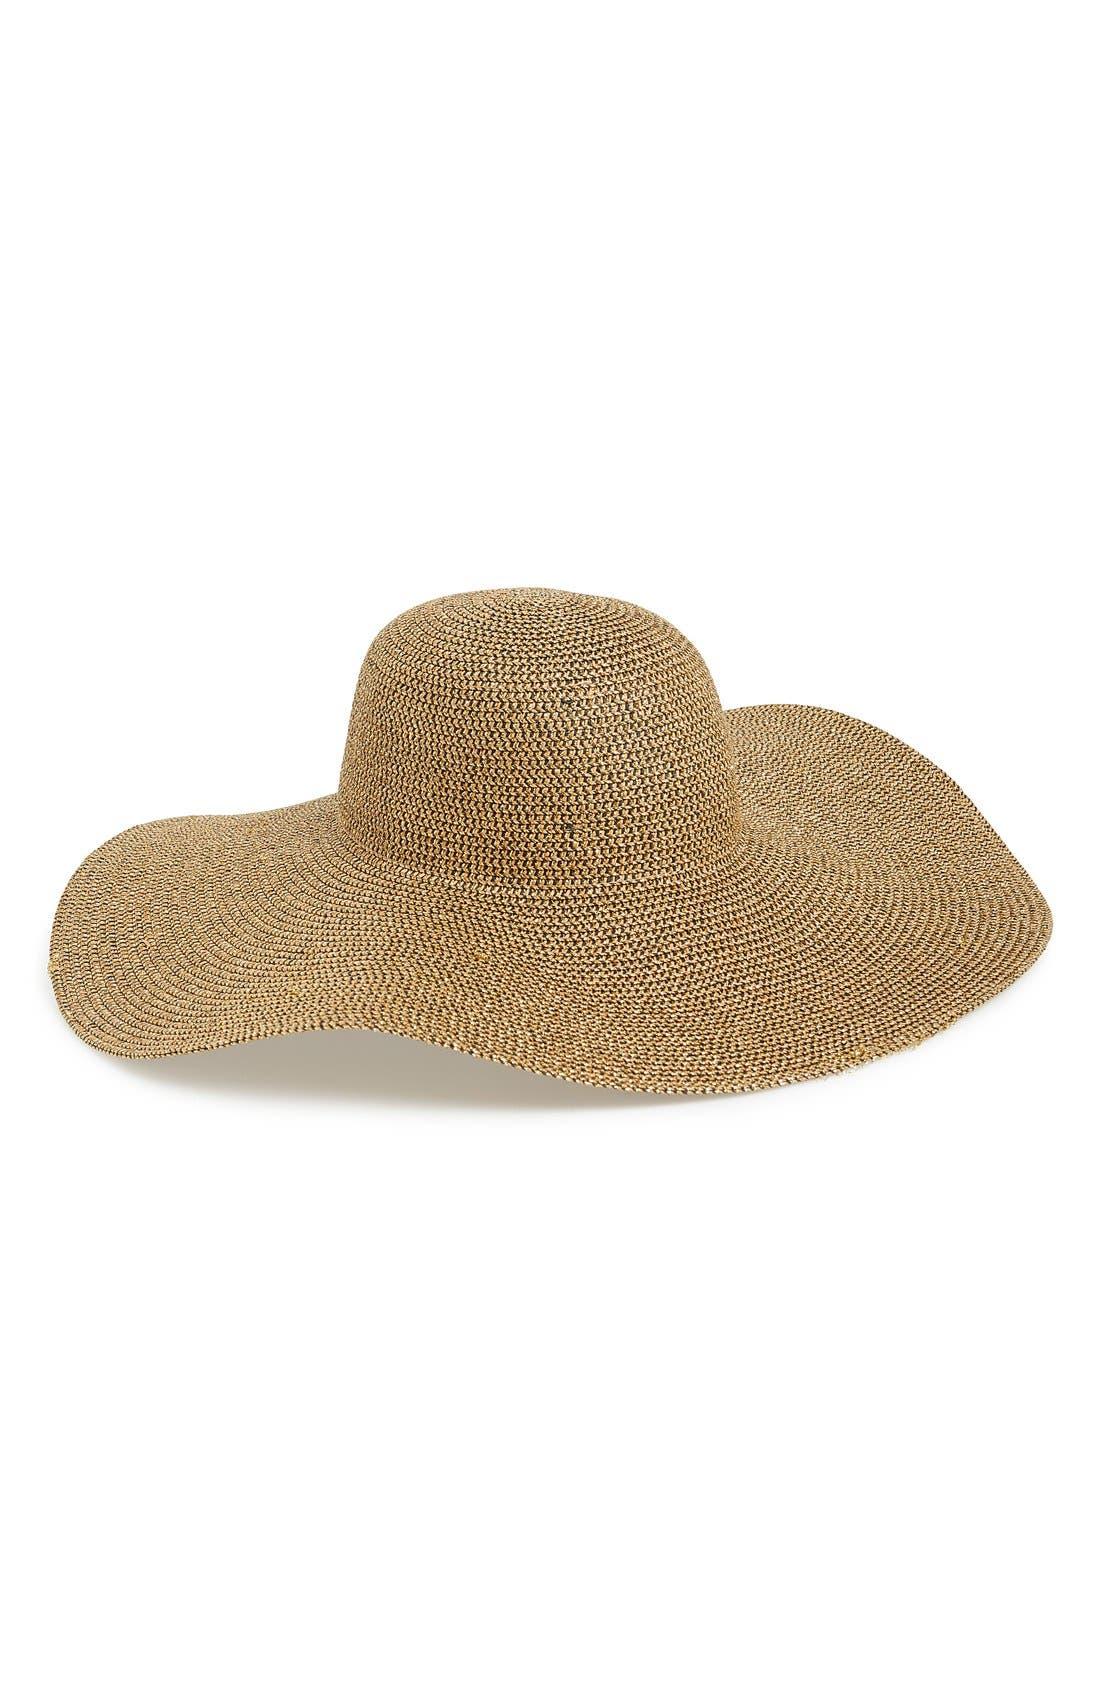 Main Image - Phase 3 Metallic Floppy Straw Hat